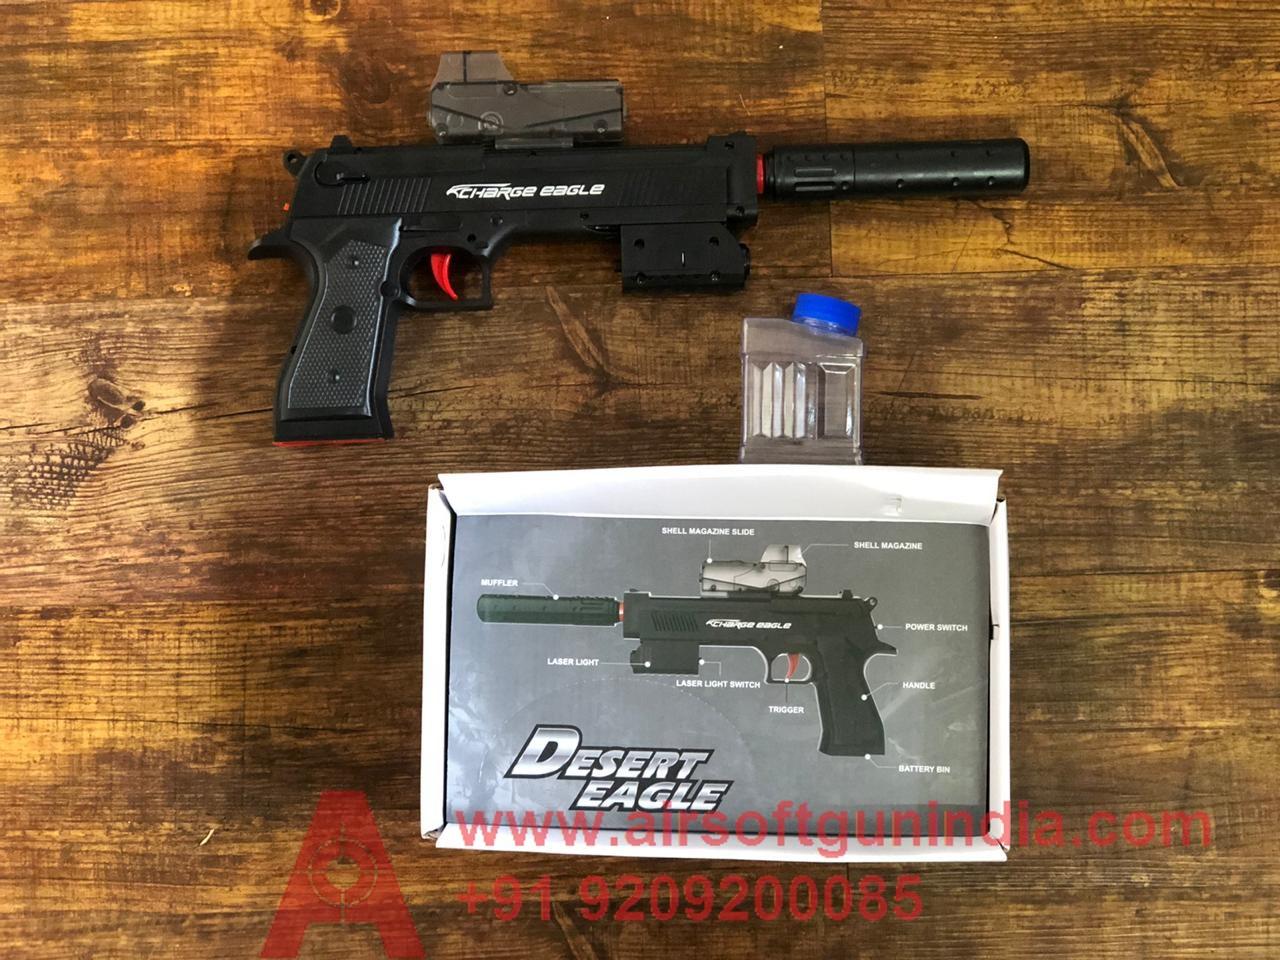 Beretta Style Automatic Gel Blaster Ebb Pistol